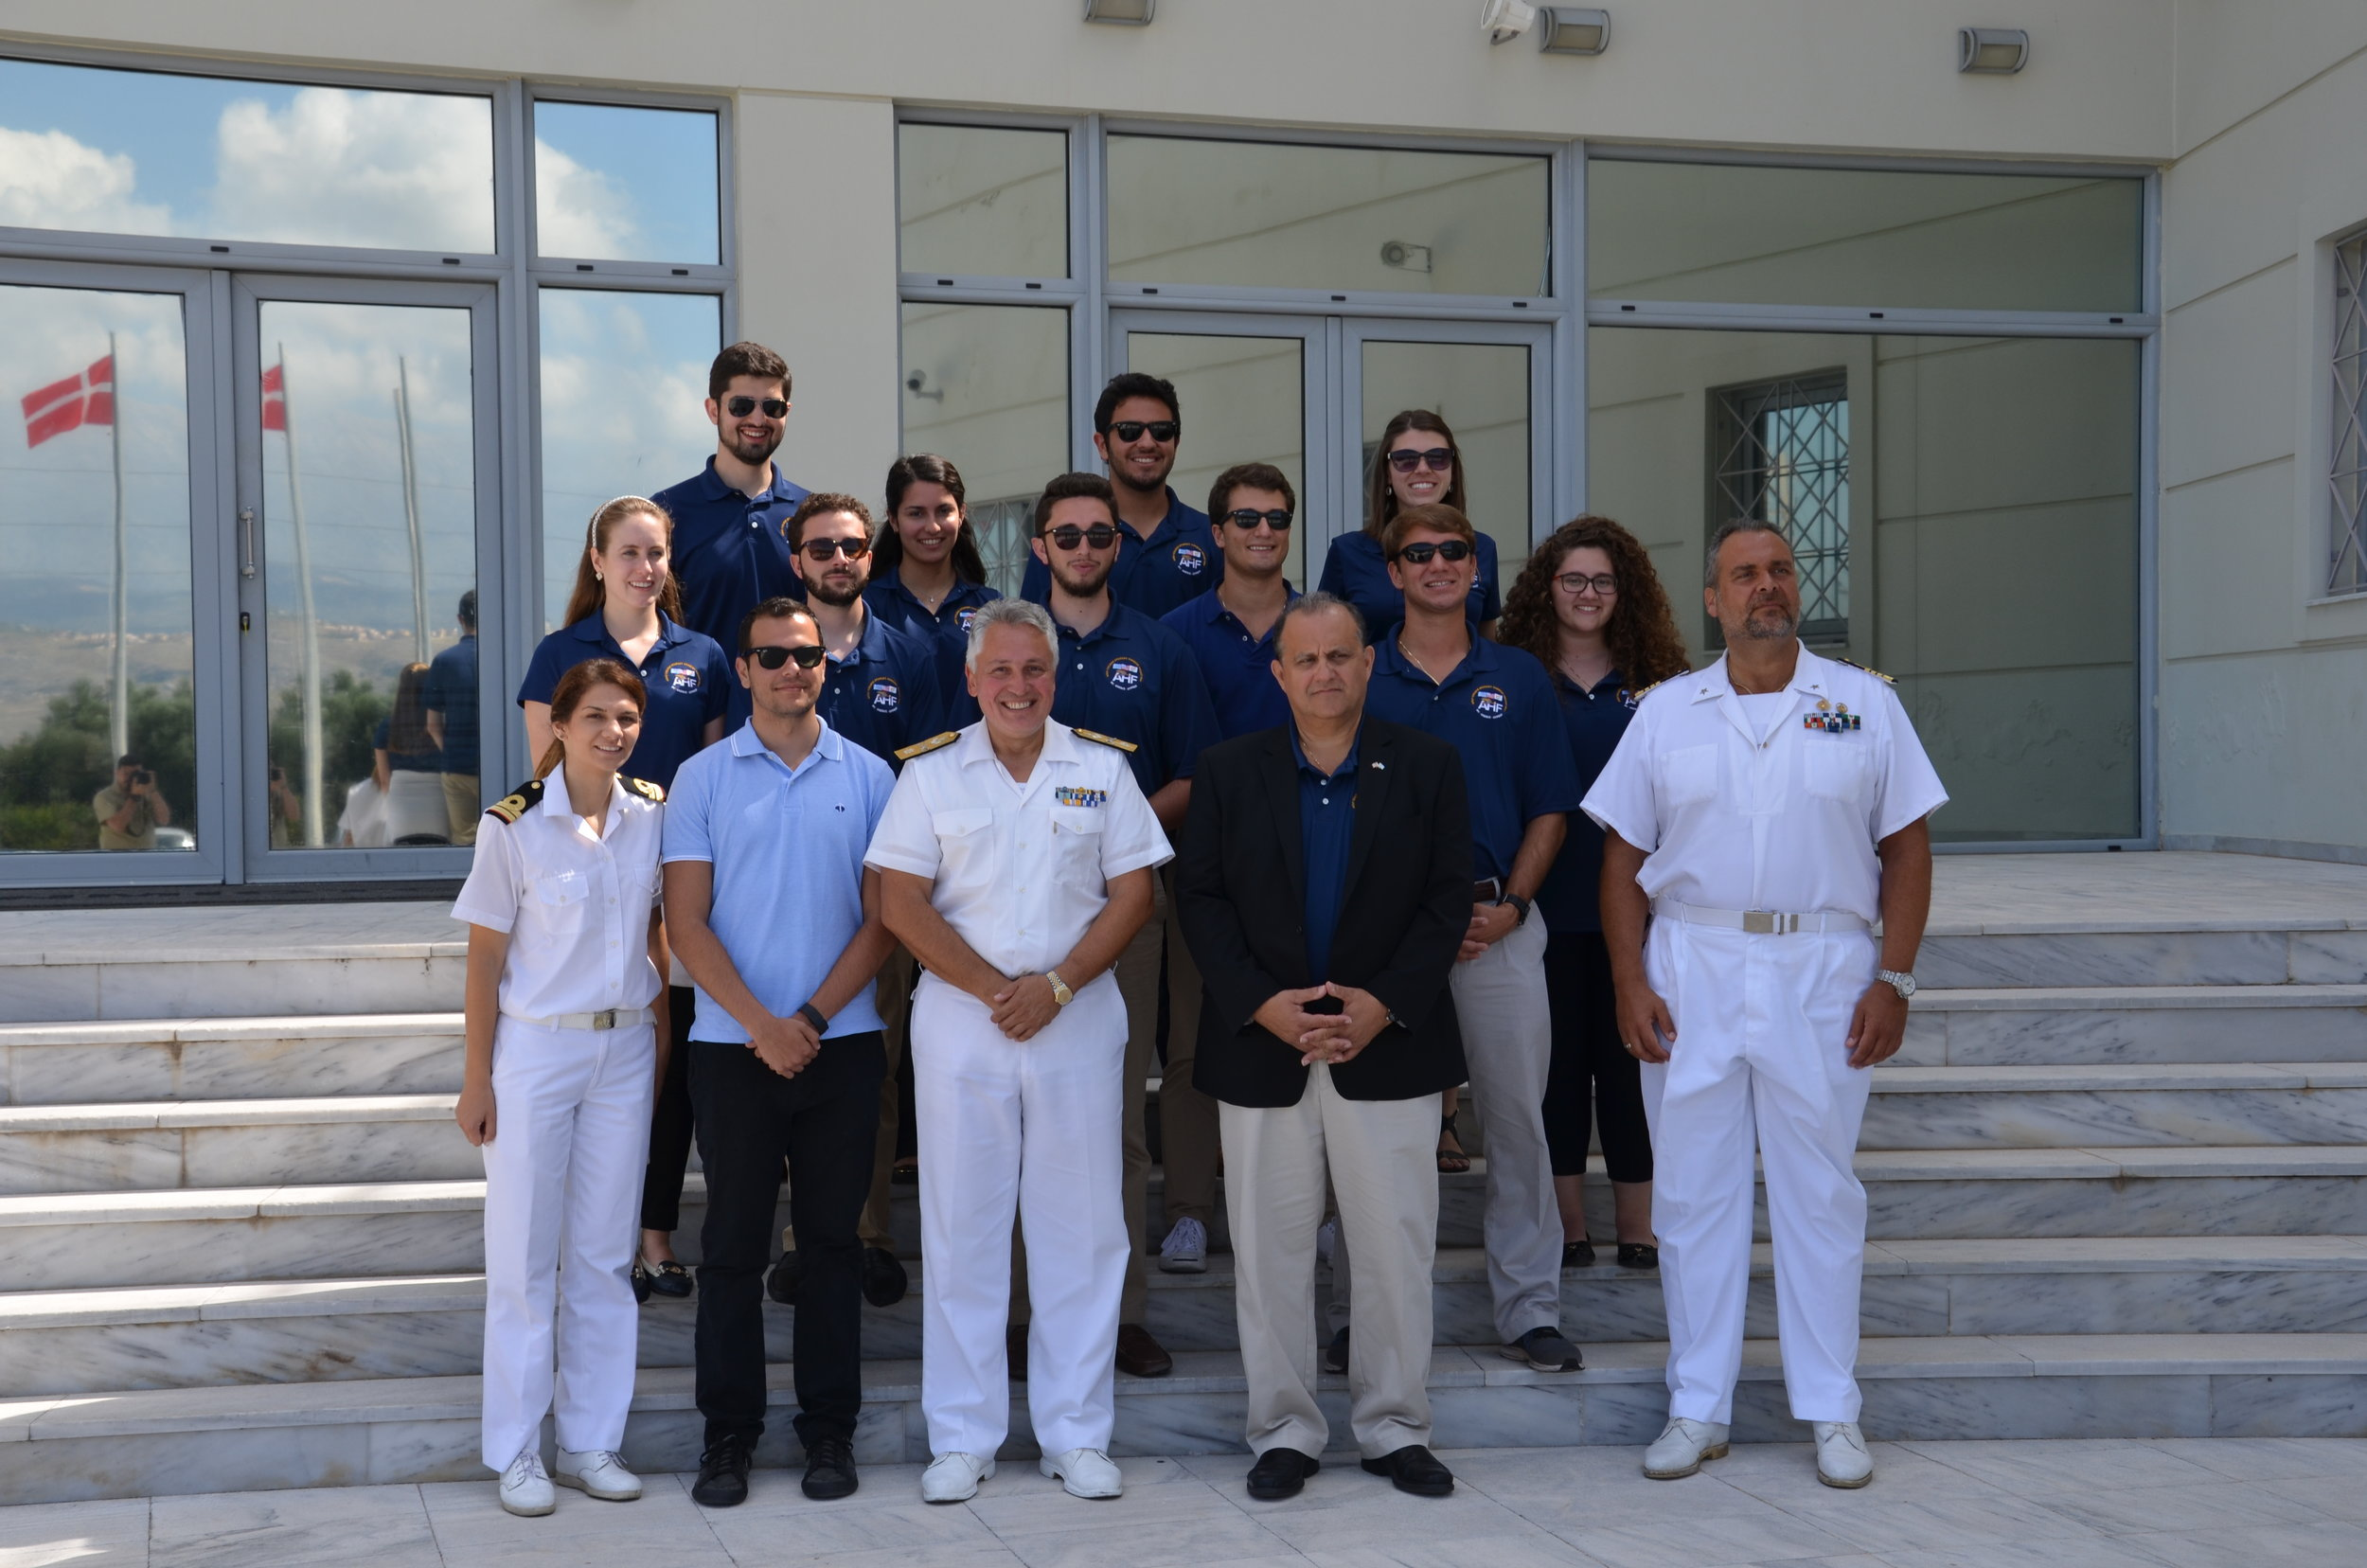 Commodore Georgios Tsogkas, Commander of the NATO Maritime Interdiction Operational Training Center (NMIOTC).